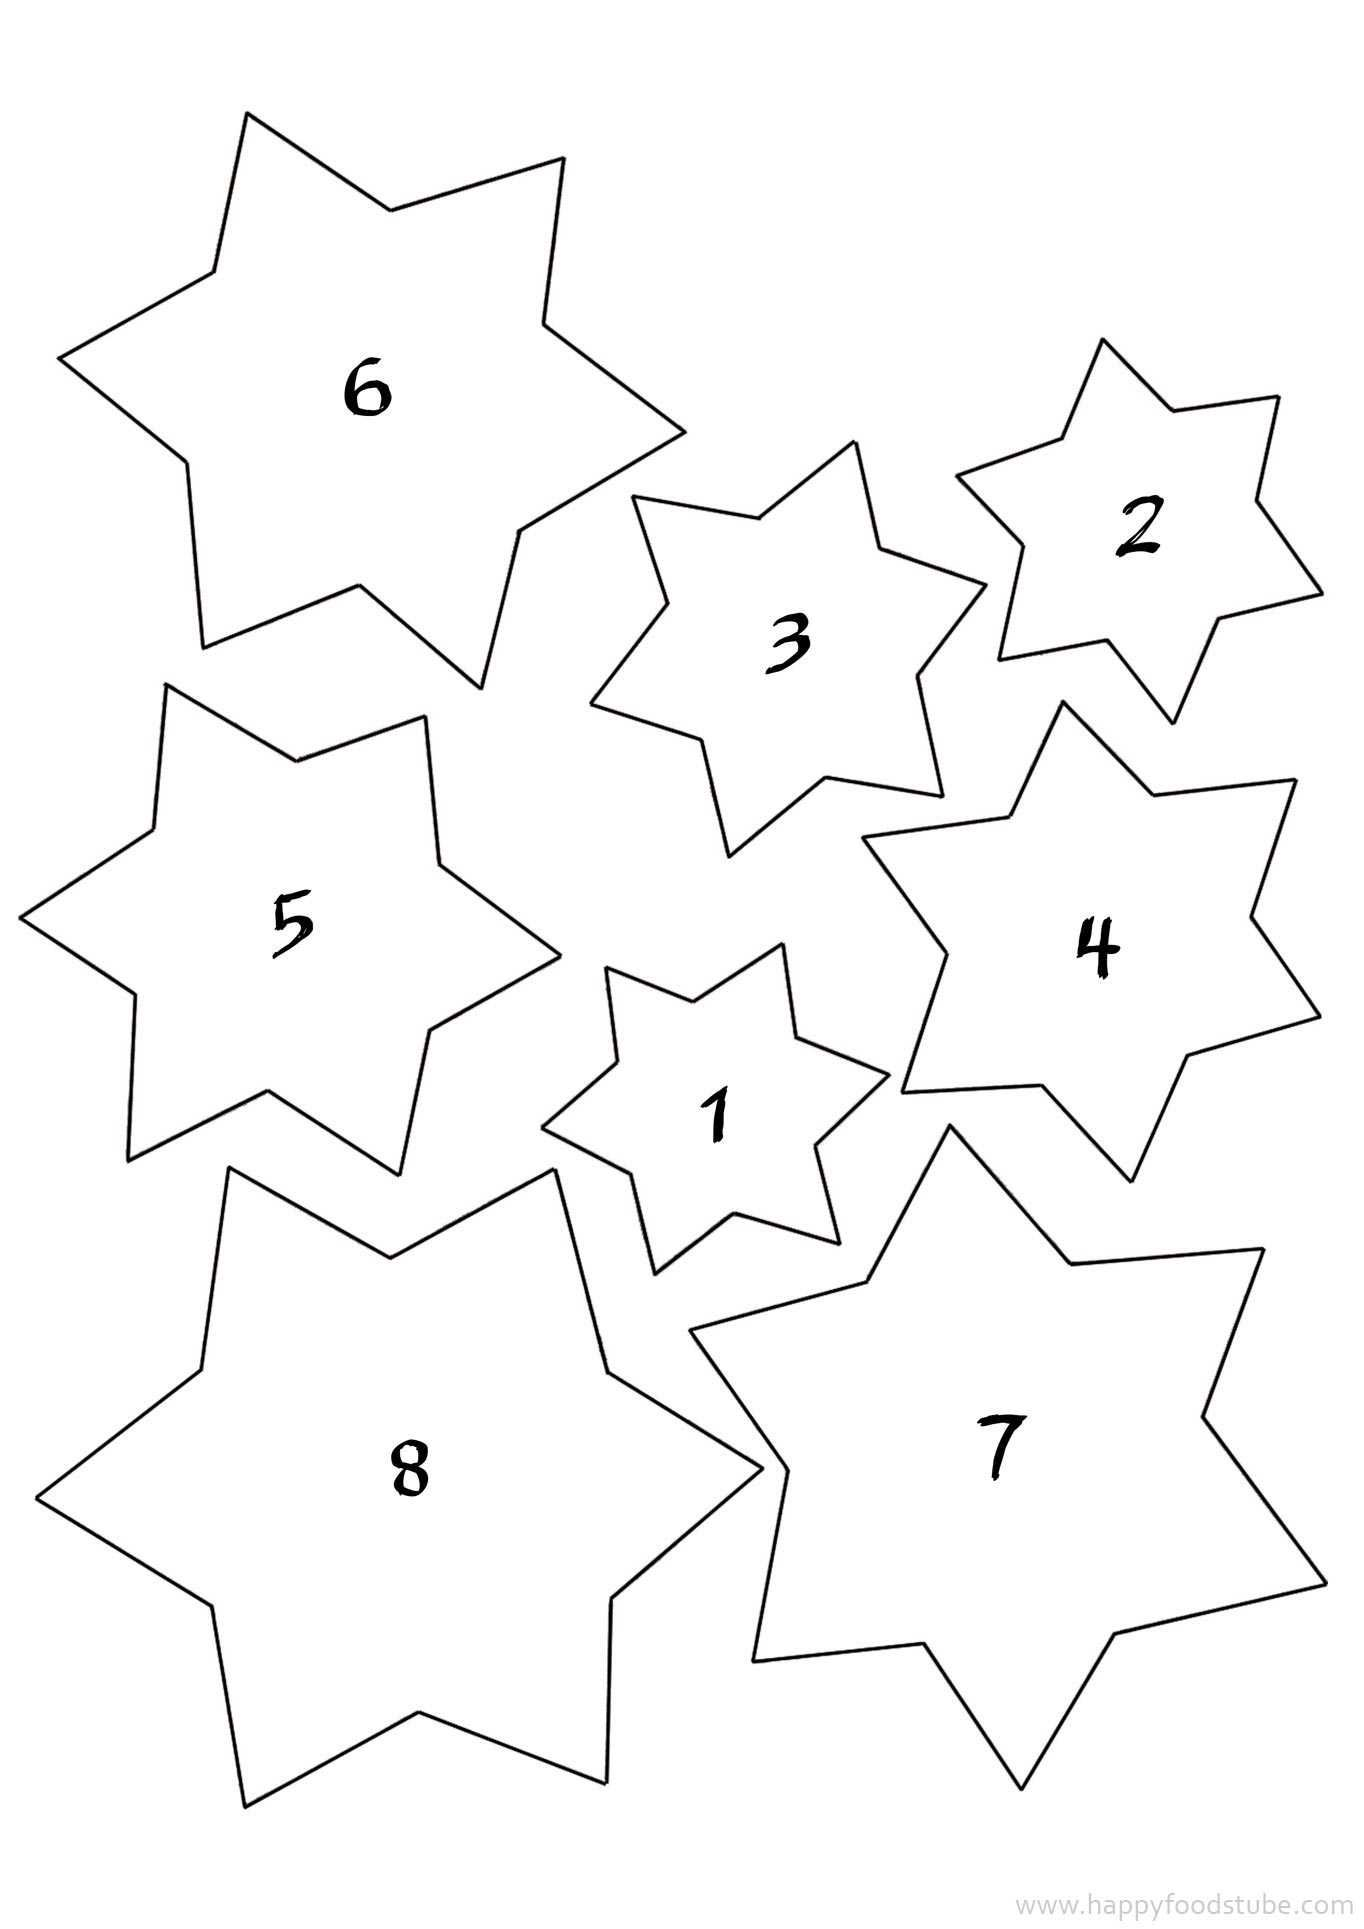 90 Beautiful Origami Printable Templates Simple Sample Ideas For